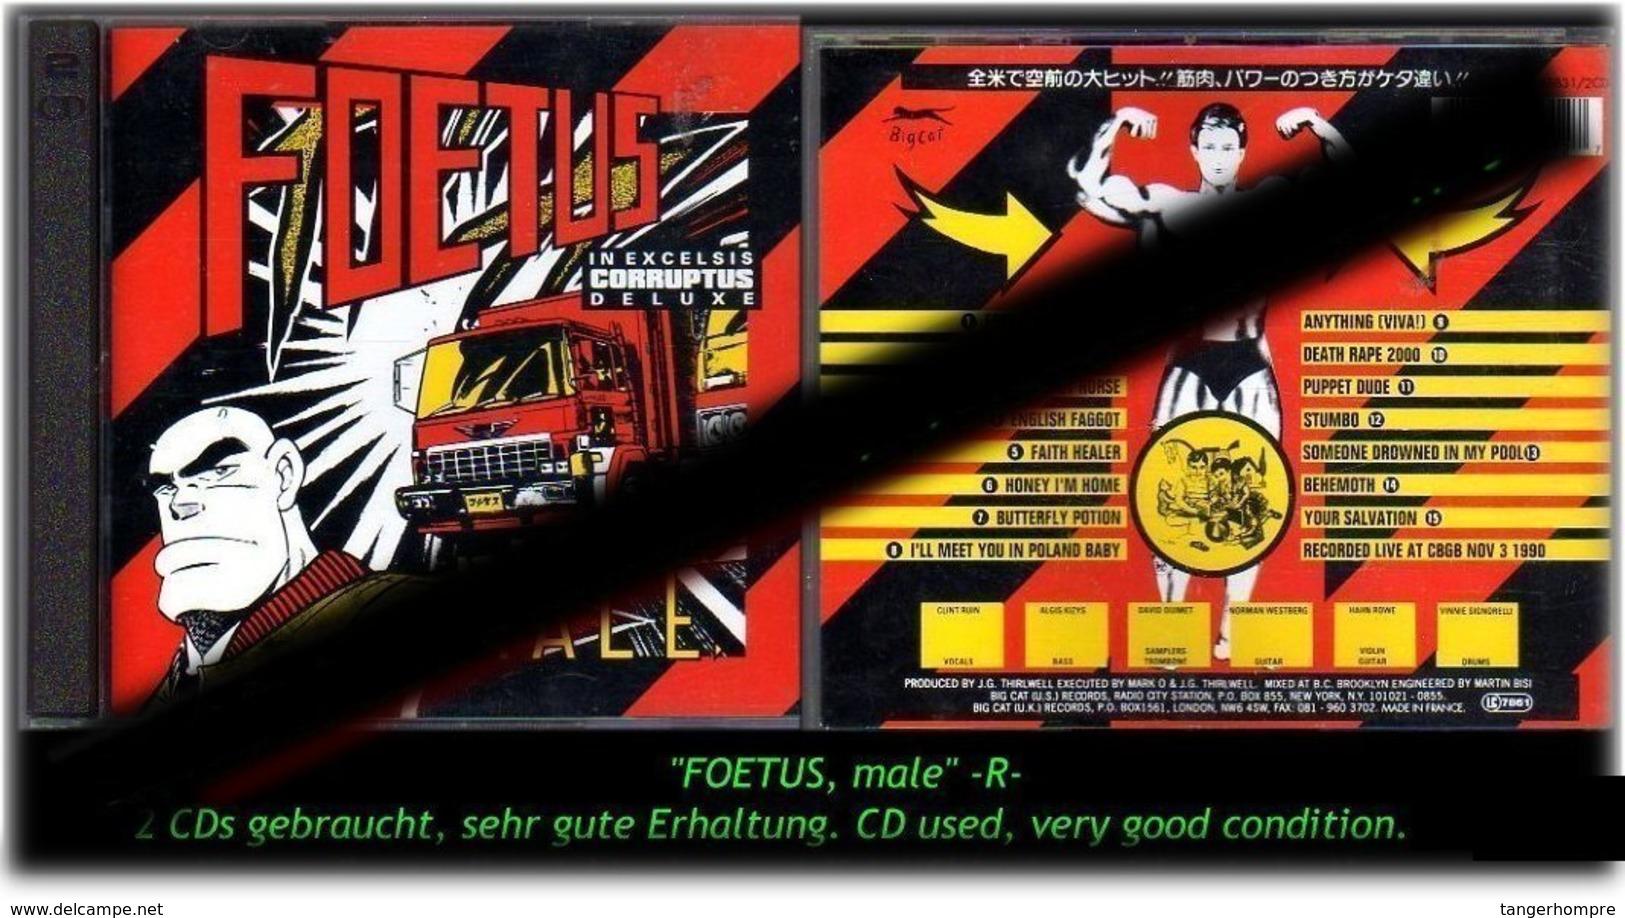 """FOETUS"" MALE -R- - Hard Rock & Metal"